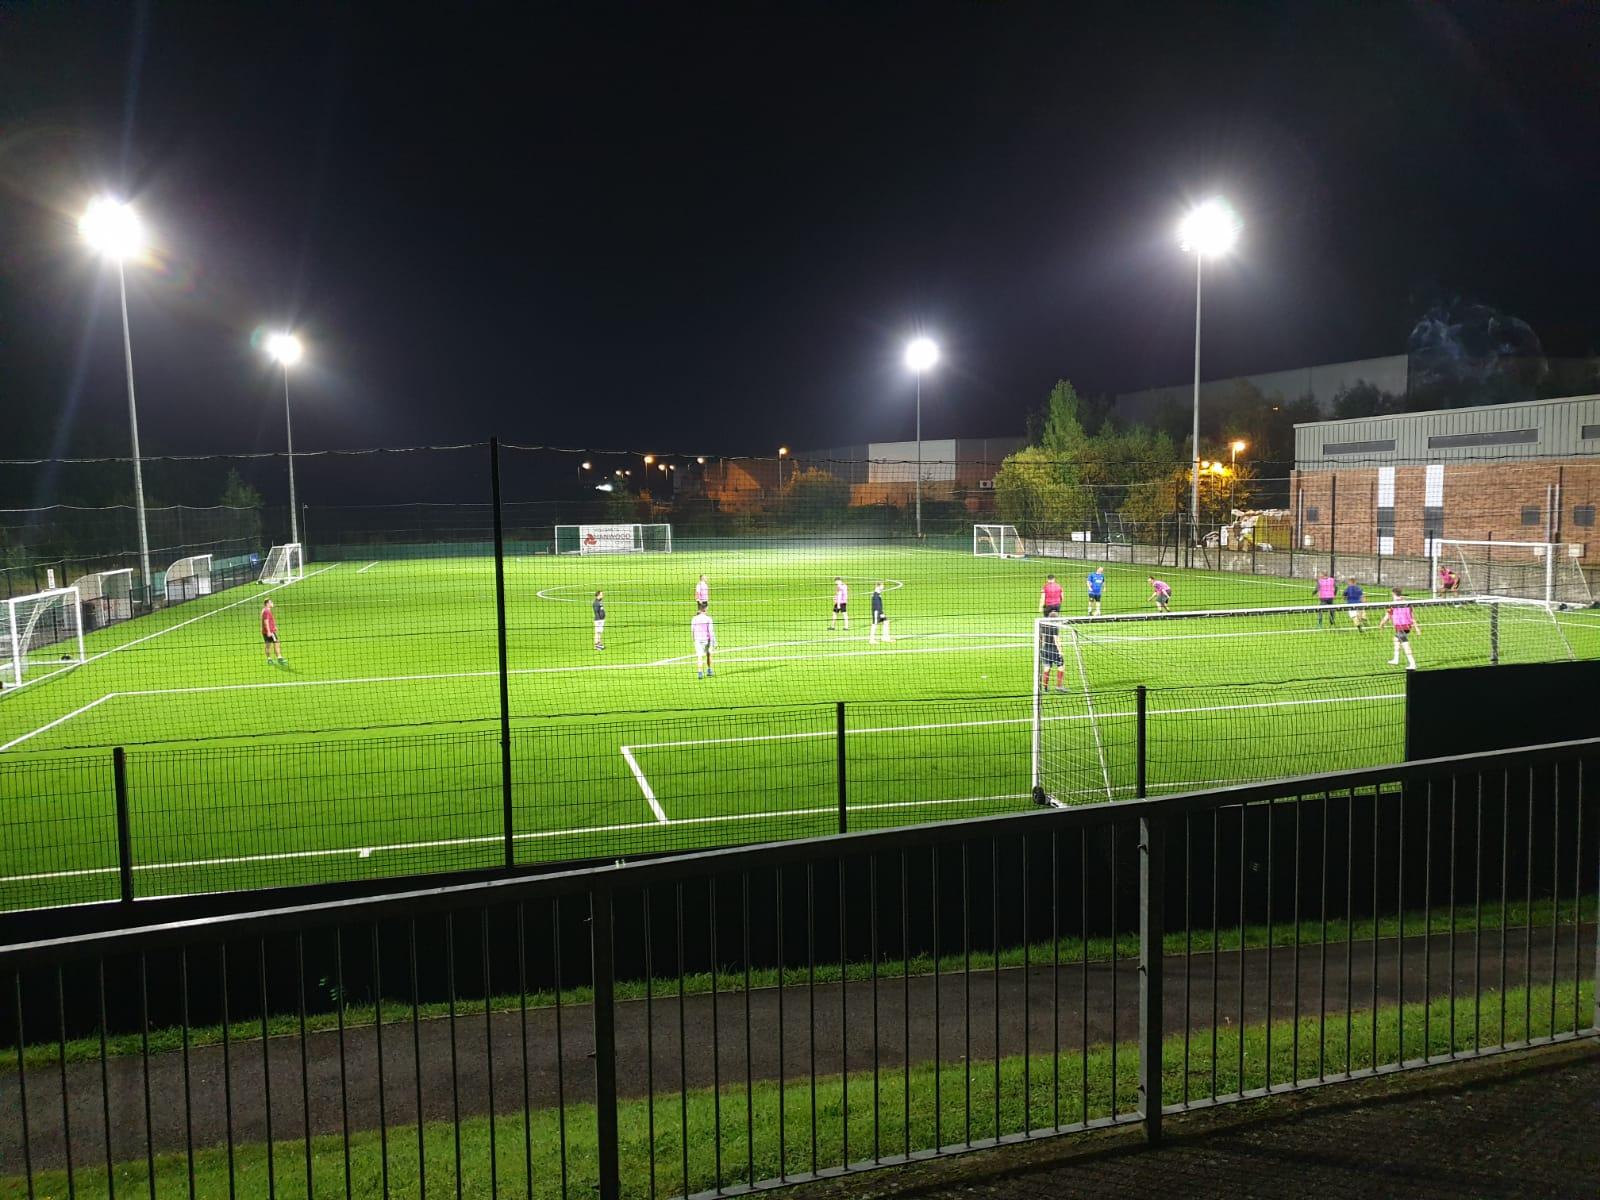 Hanwood Sports Centre, Sports Lighting Case Study